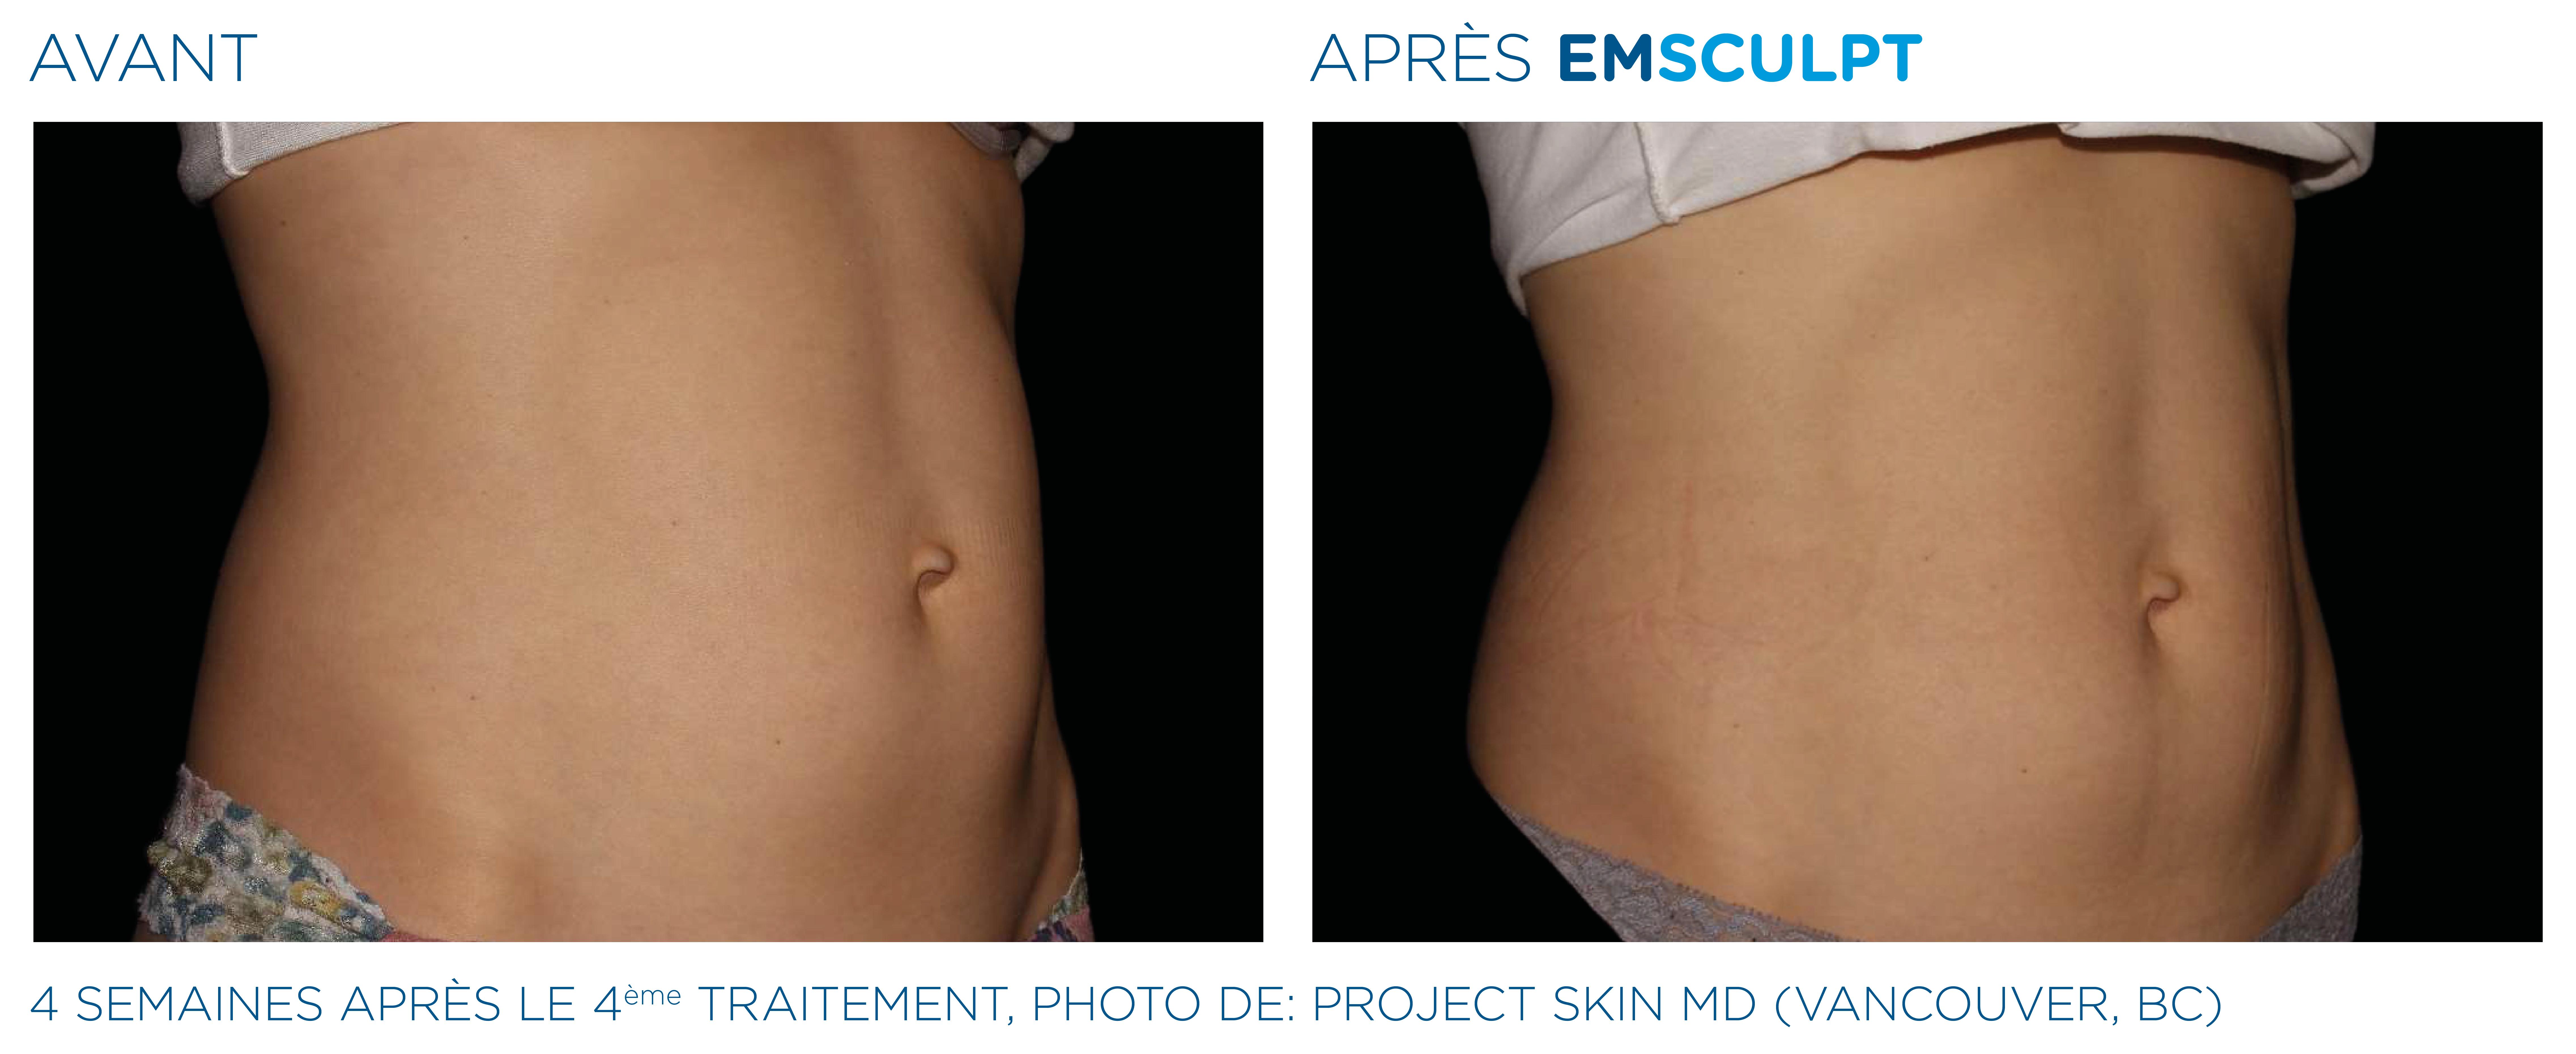 Emsculpt_PIC_Ba-card-female-abdomen-047_FR100